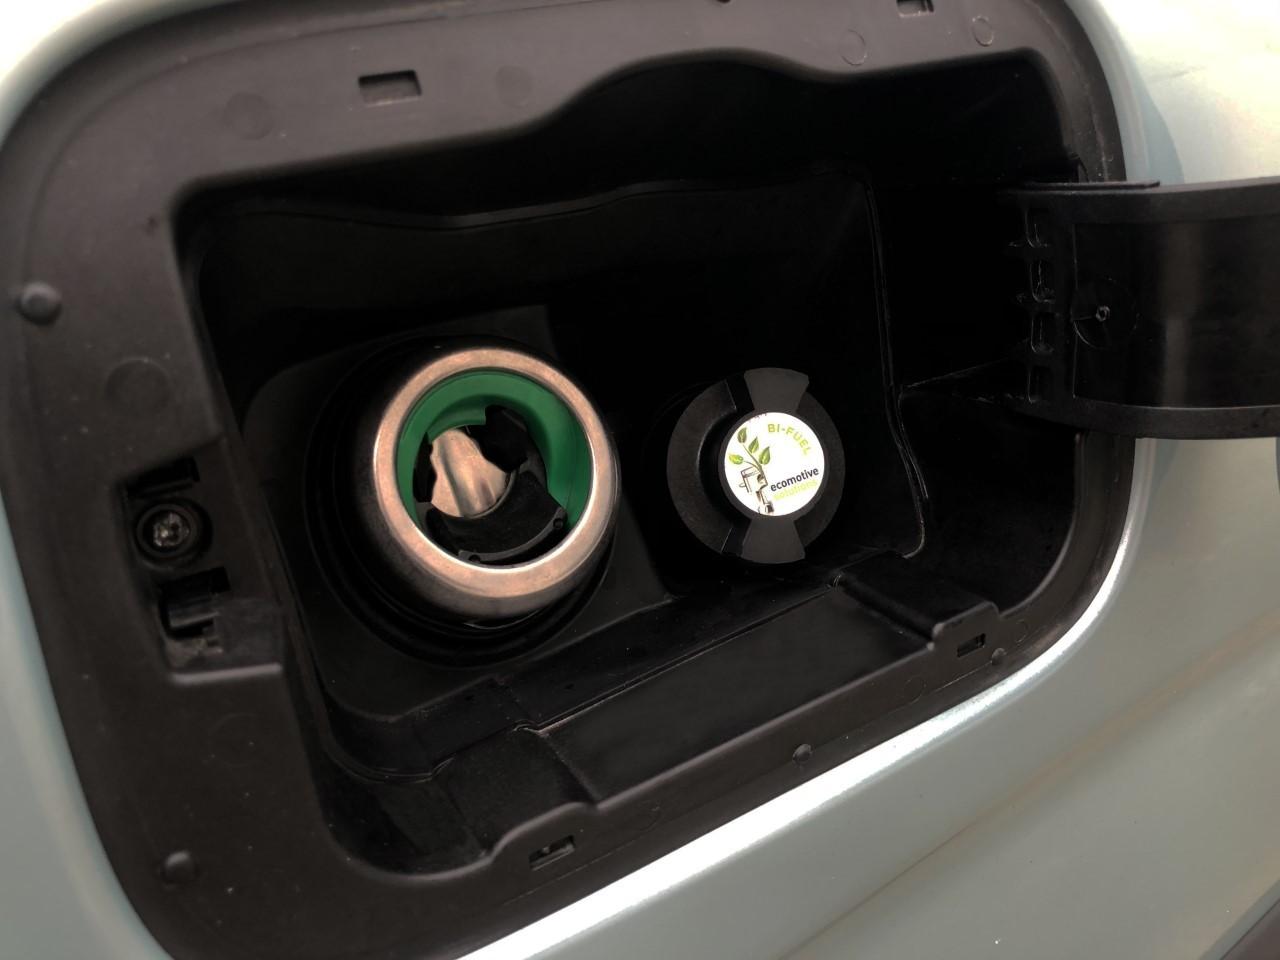 Fiat Panda Hybrid City Cross a metano - Foto ufficiali